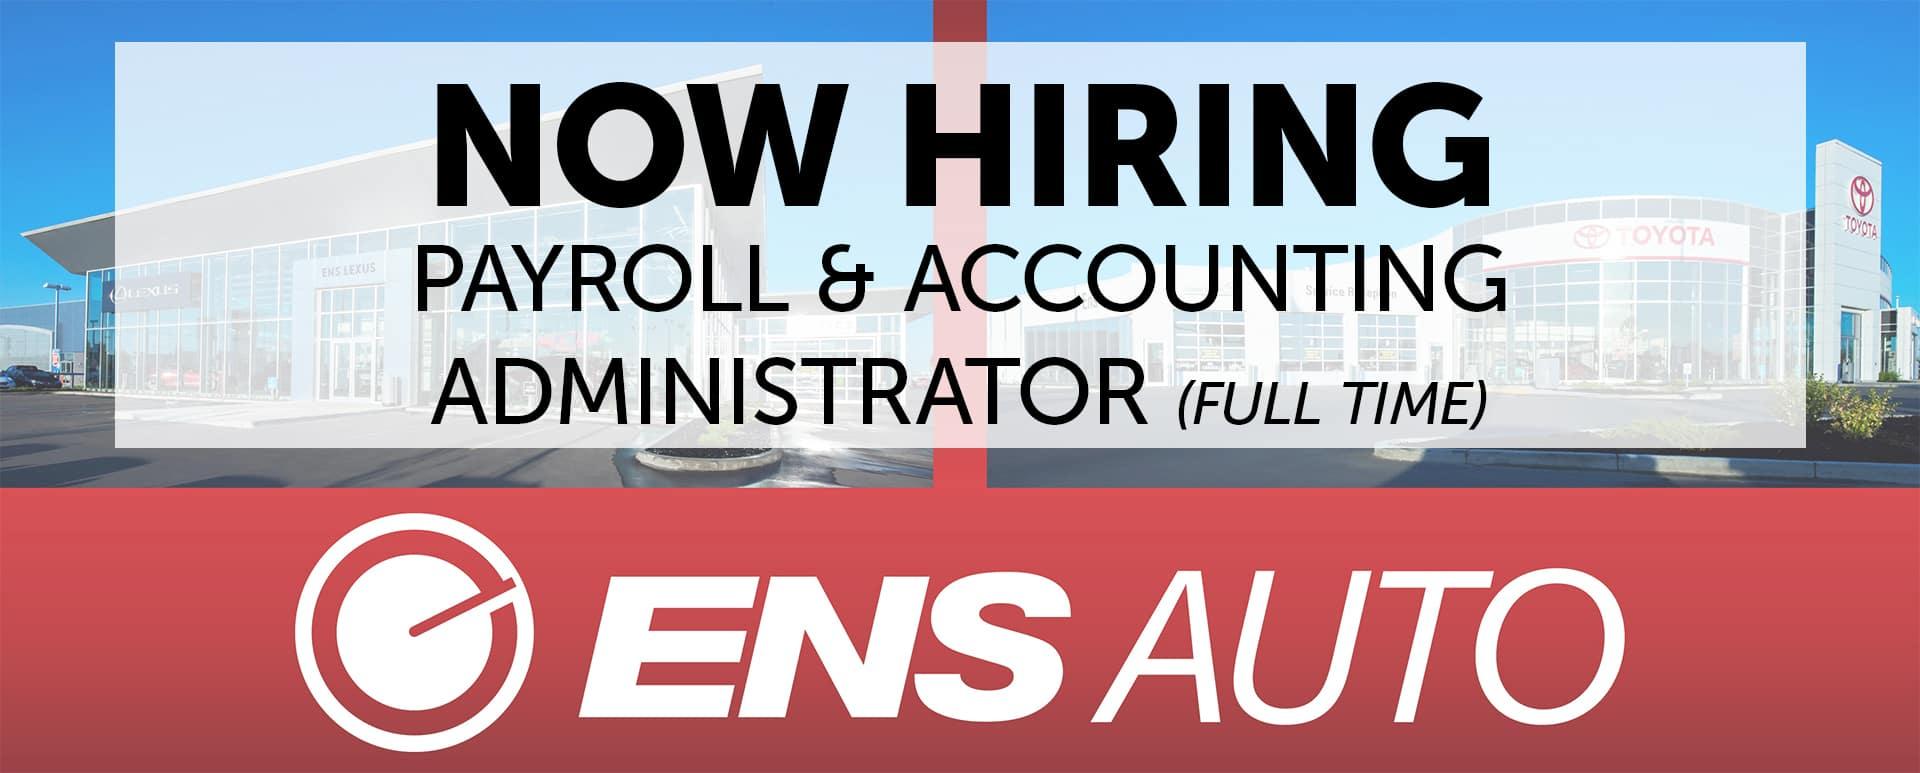 Now Hiring Payroll & Accounting Administrator